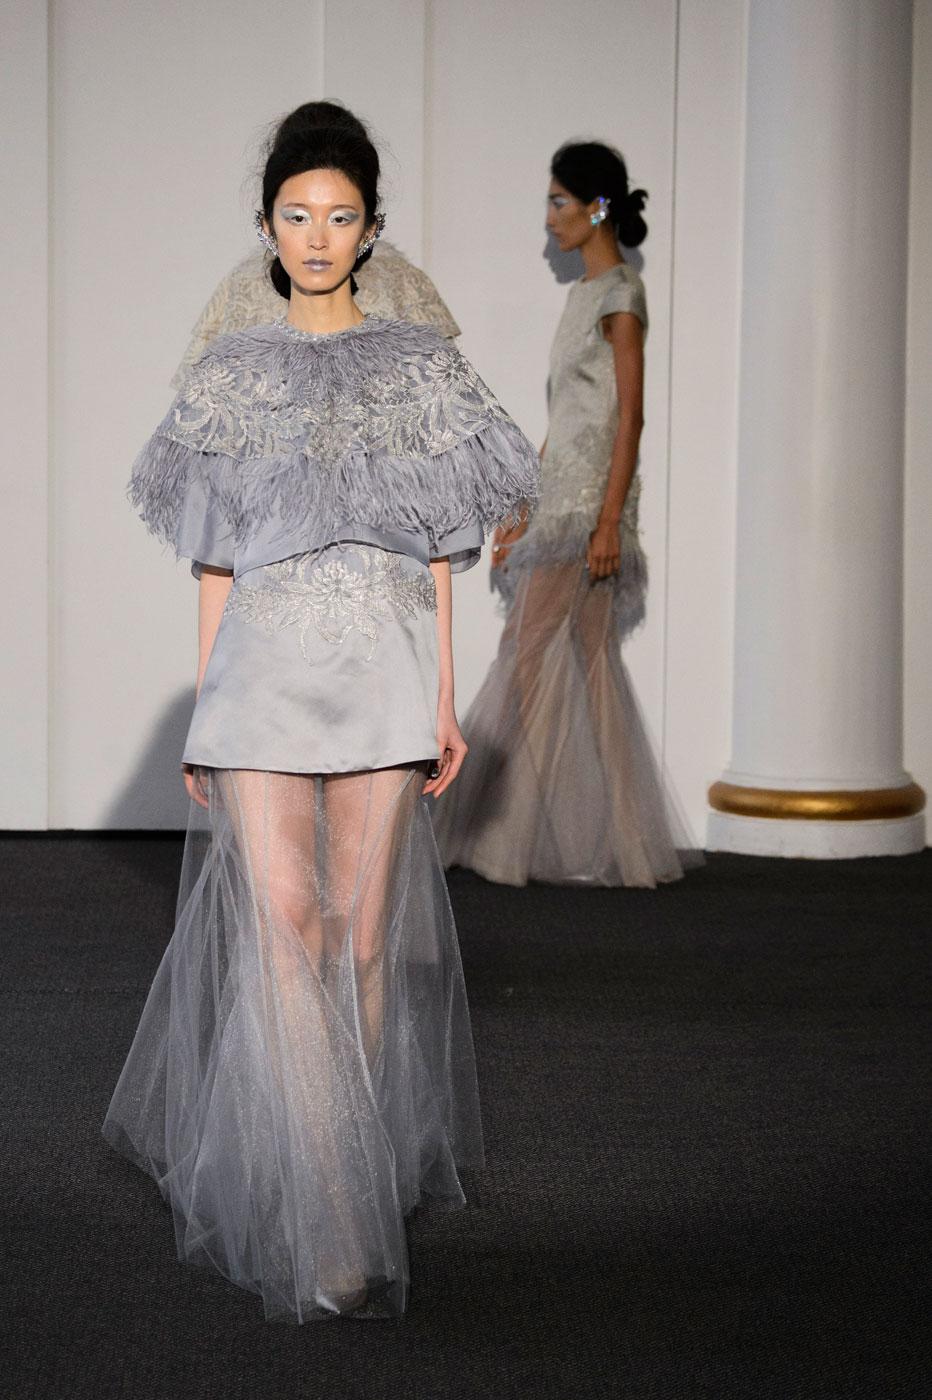 Busardi-fashion-runway-show-haute-couture-paris-spring-2015-the-impression-67